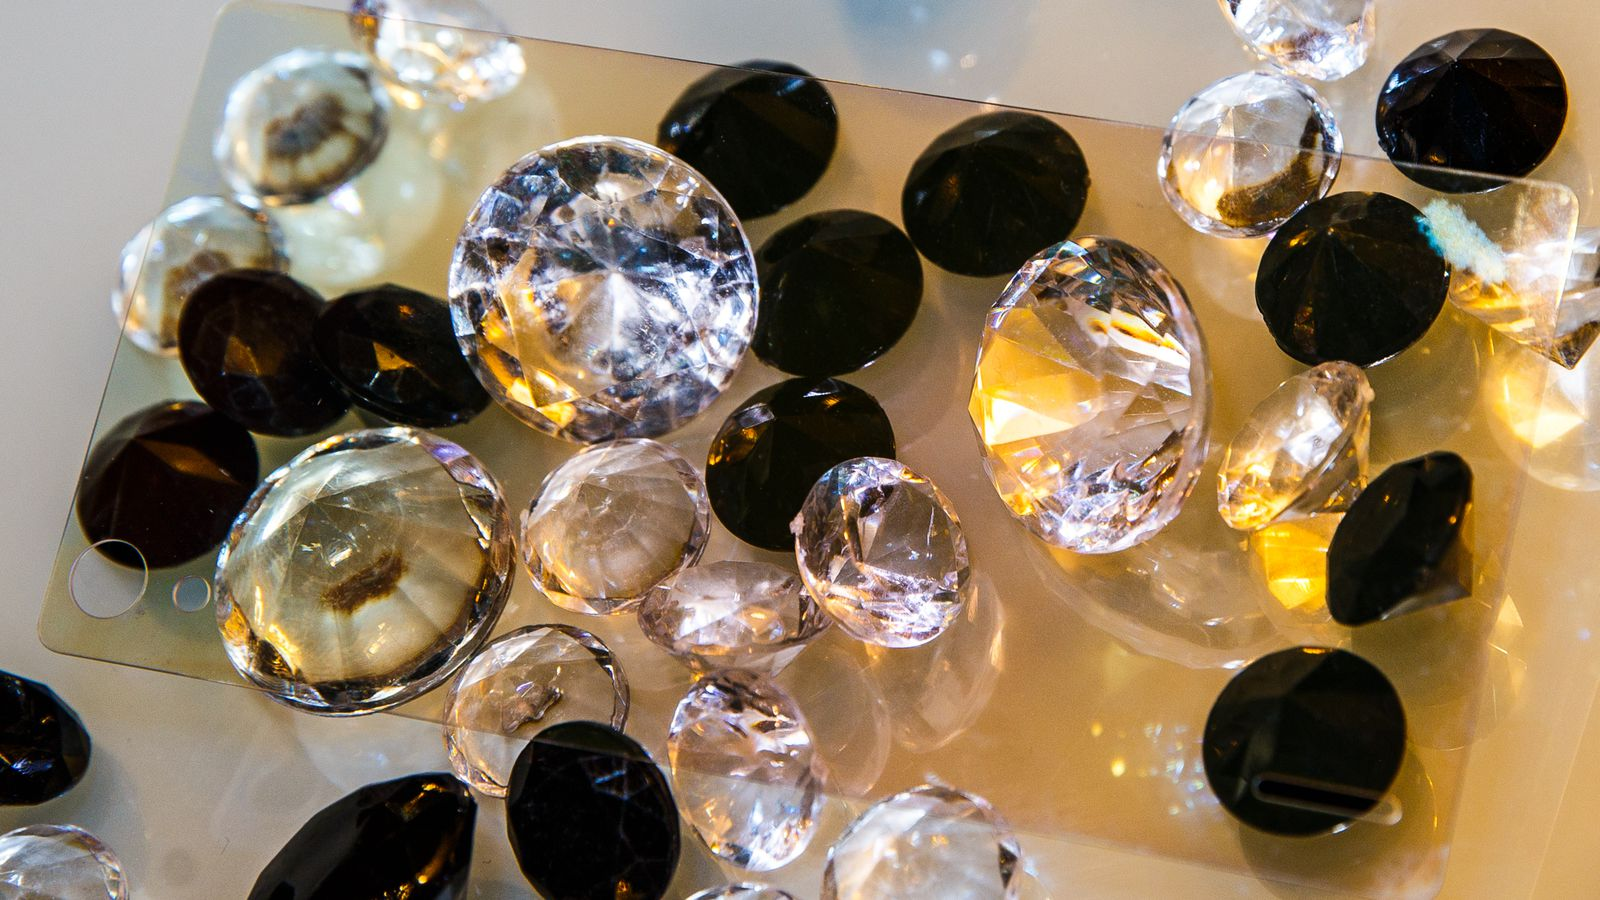 diamond-glass-4289-002.jpg (218.99 Kb)